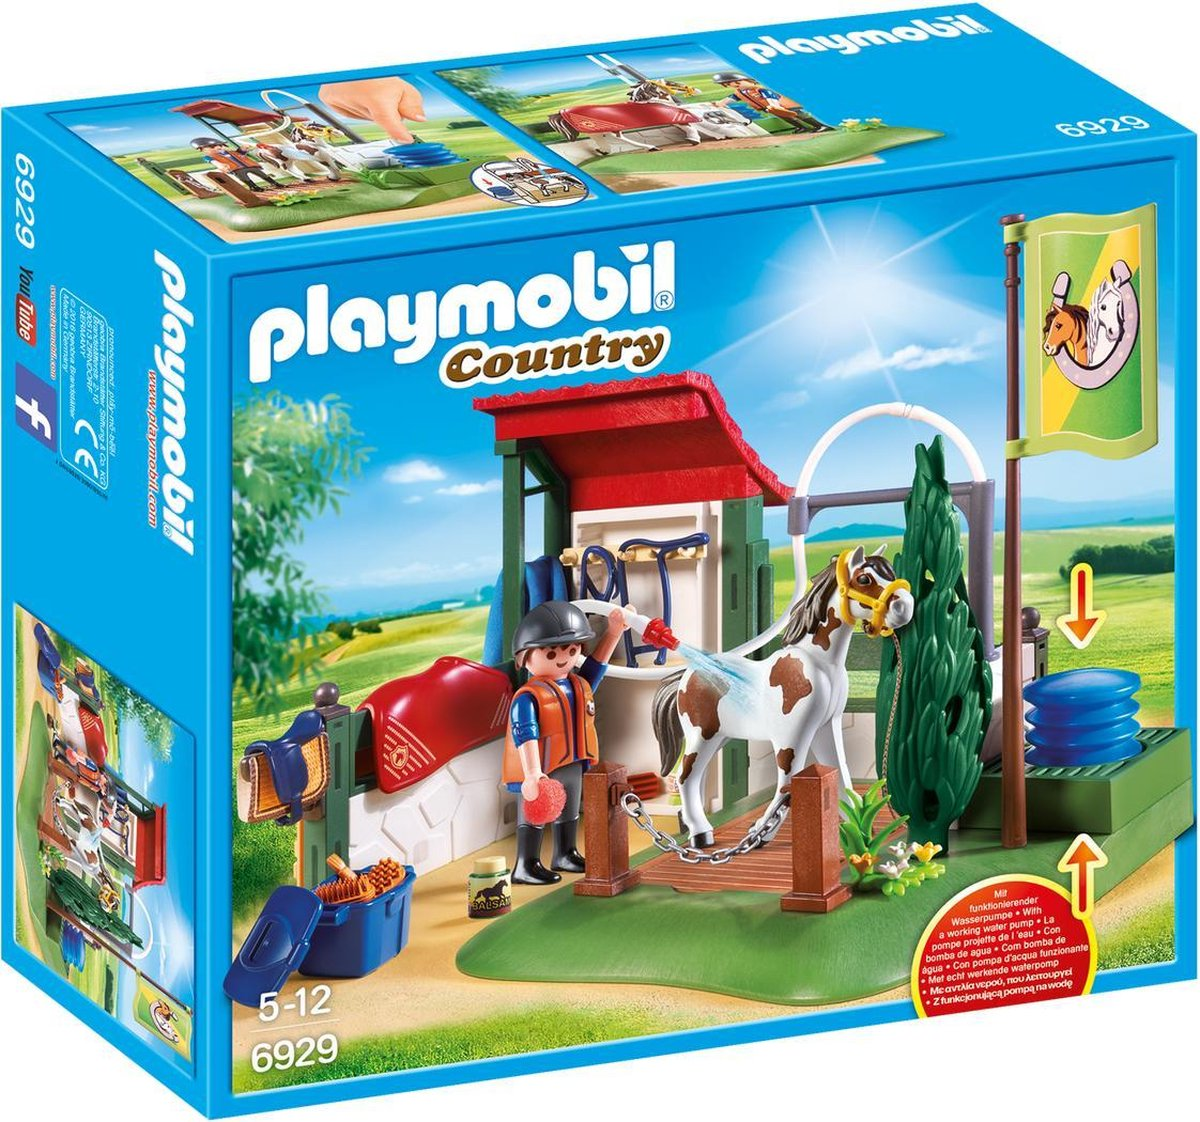 PLAYMOBIL Country Paardenwasplaats - 6929